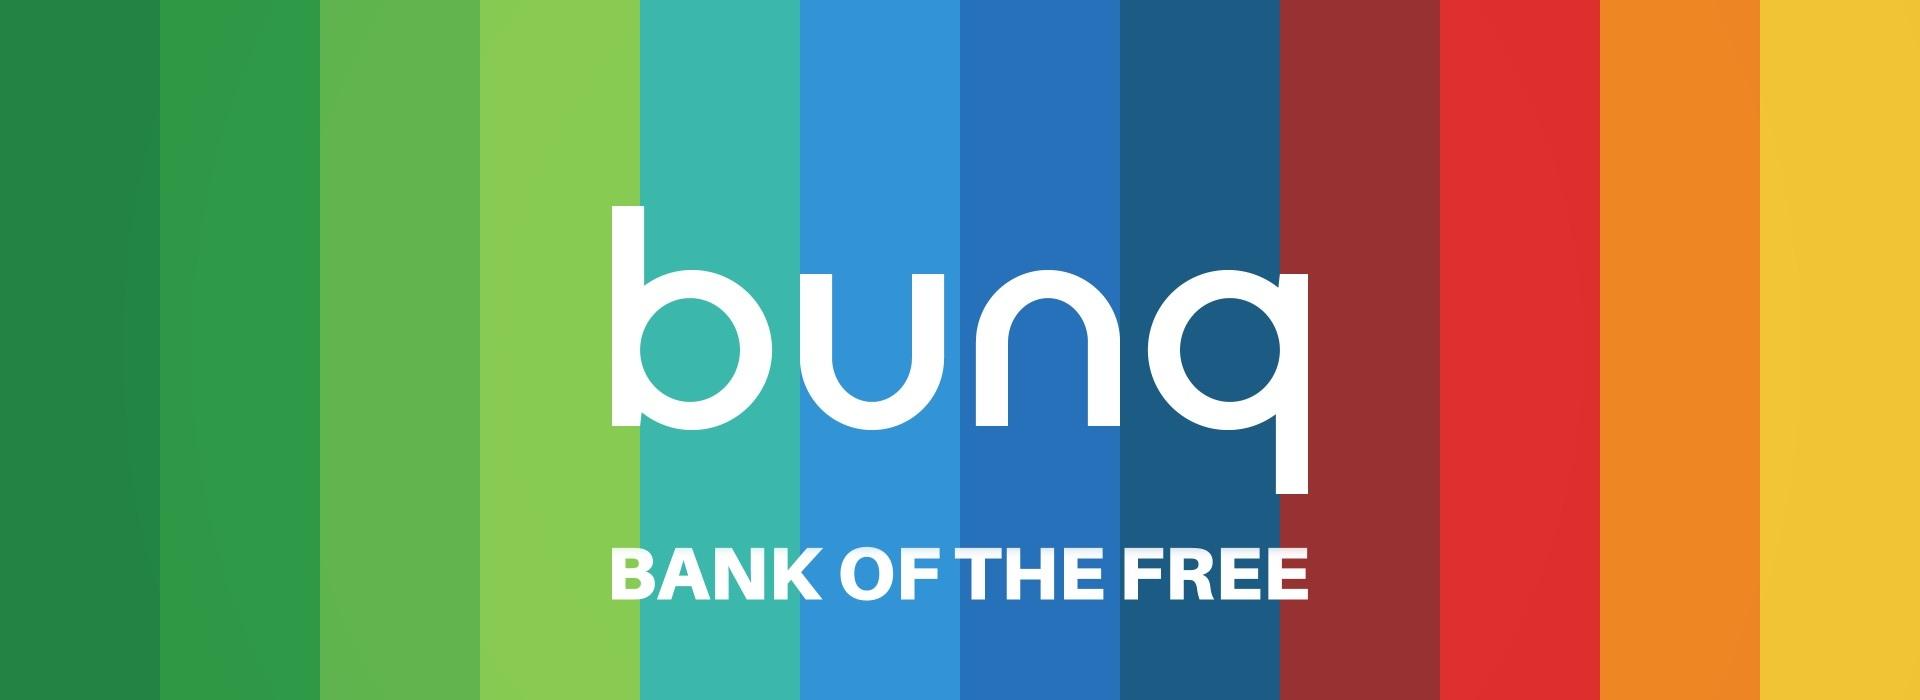 BUNQ Easy Money Business